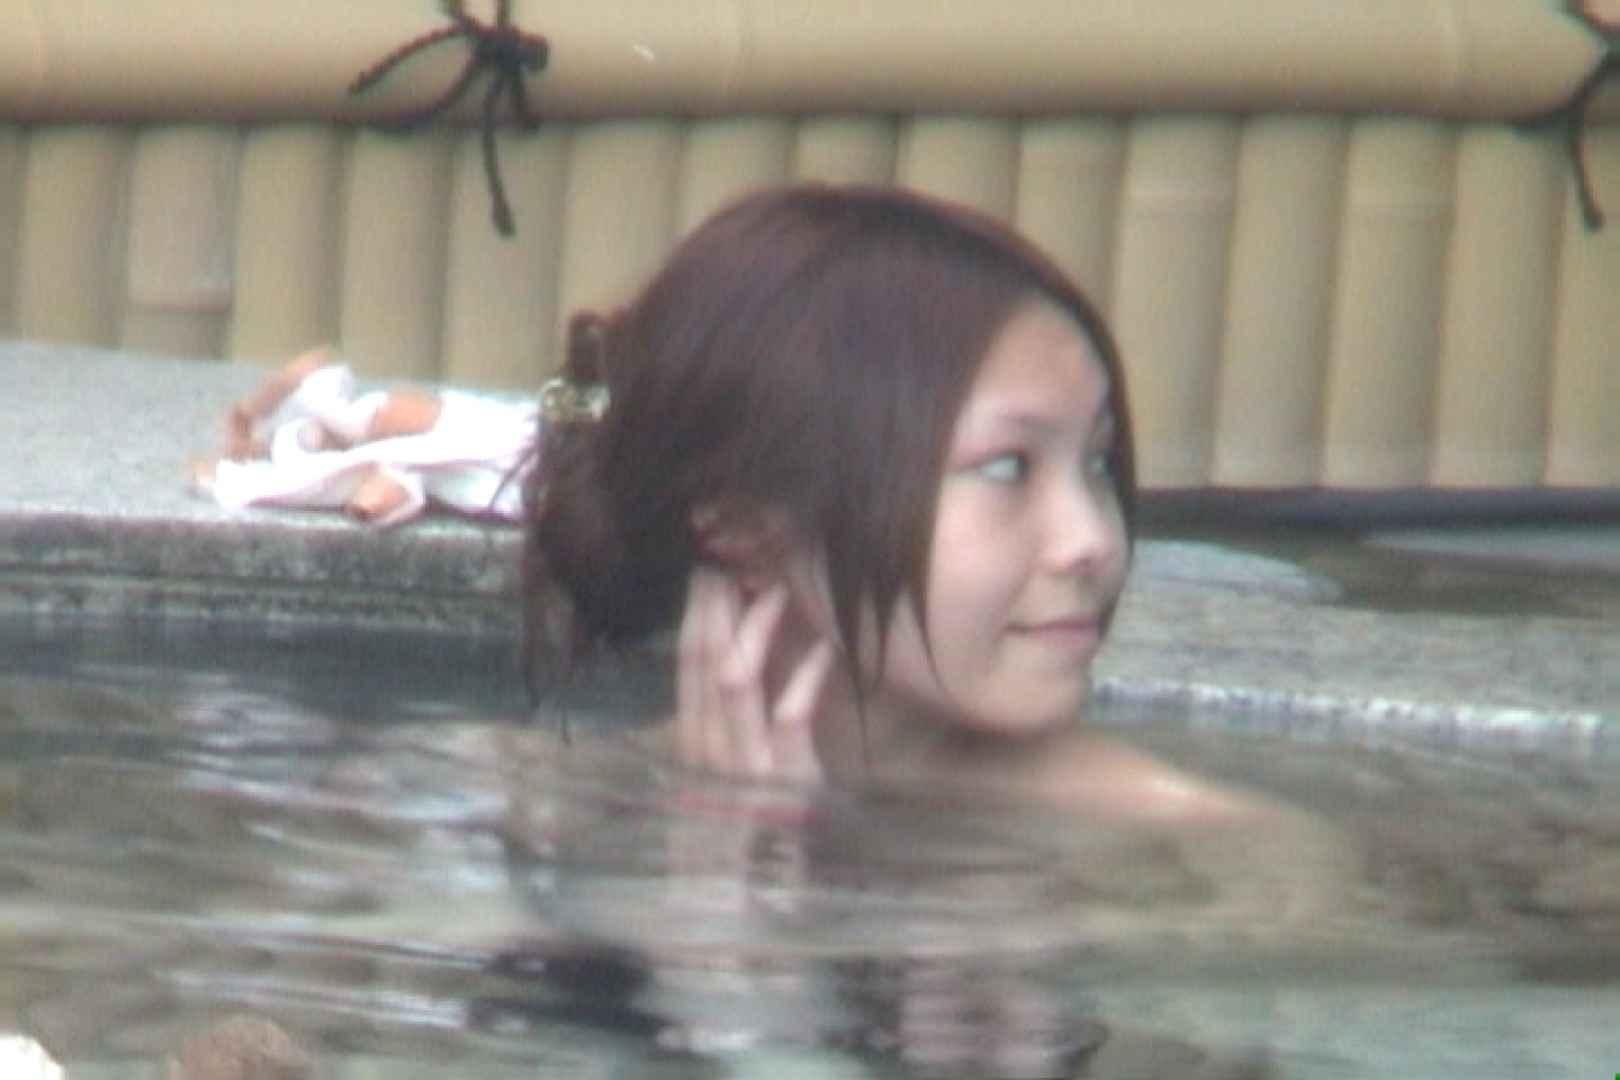 Aquaな露天風呂Vol.570 盗撮 のぞき動画画像 71枚 35